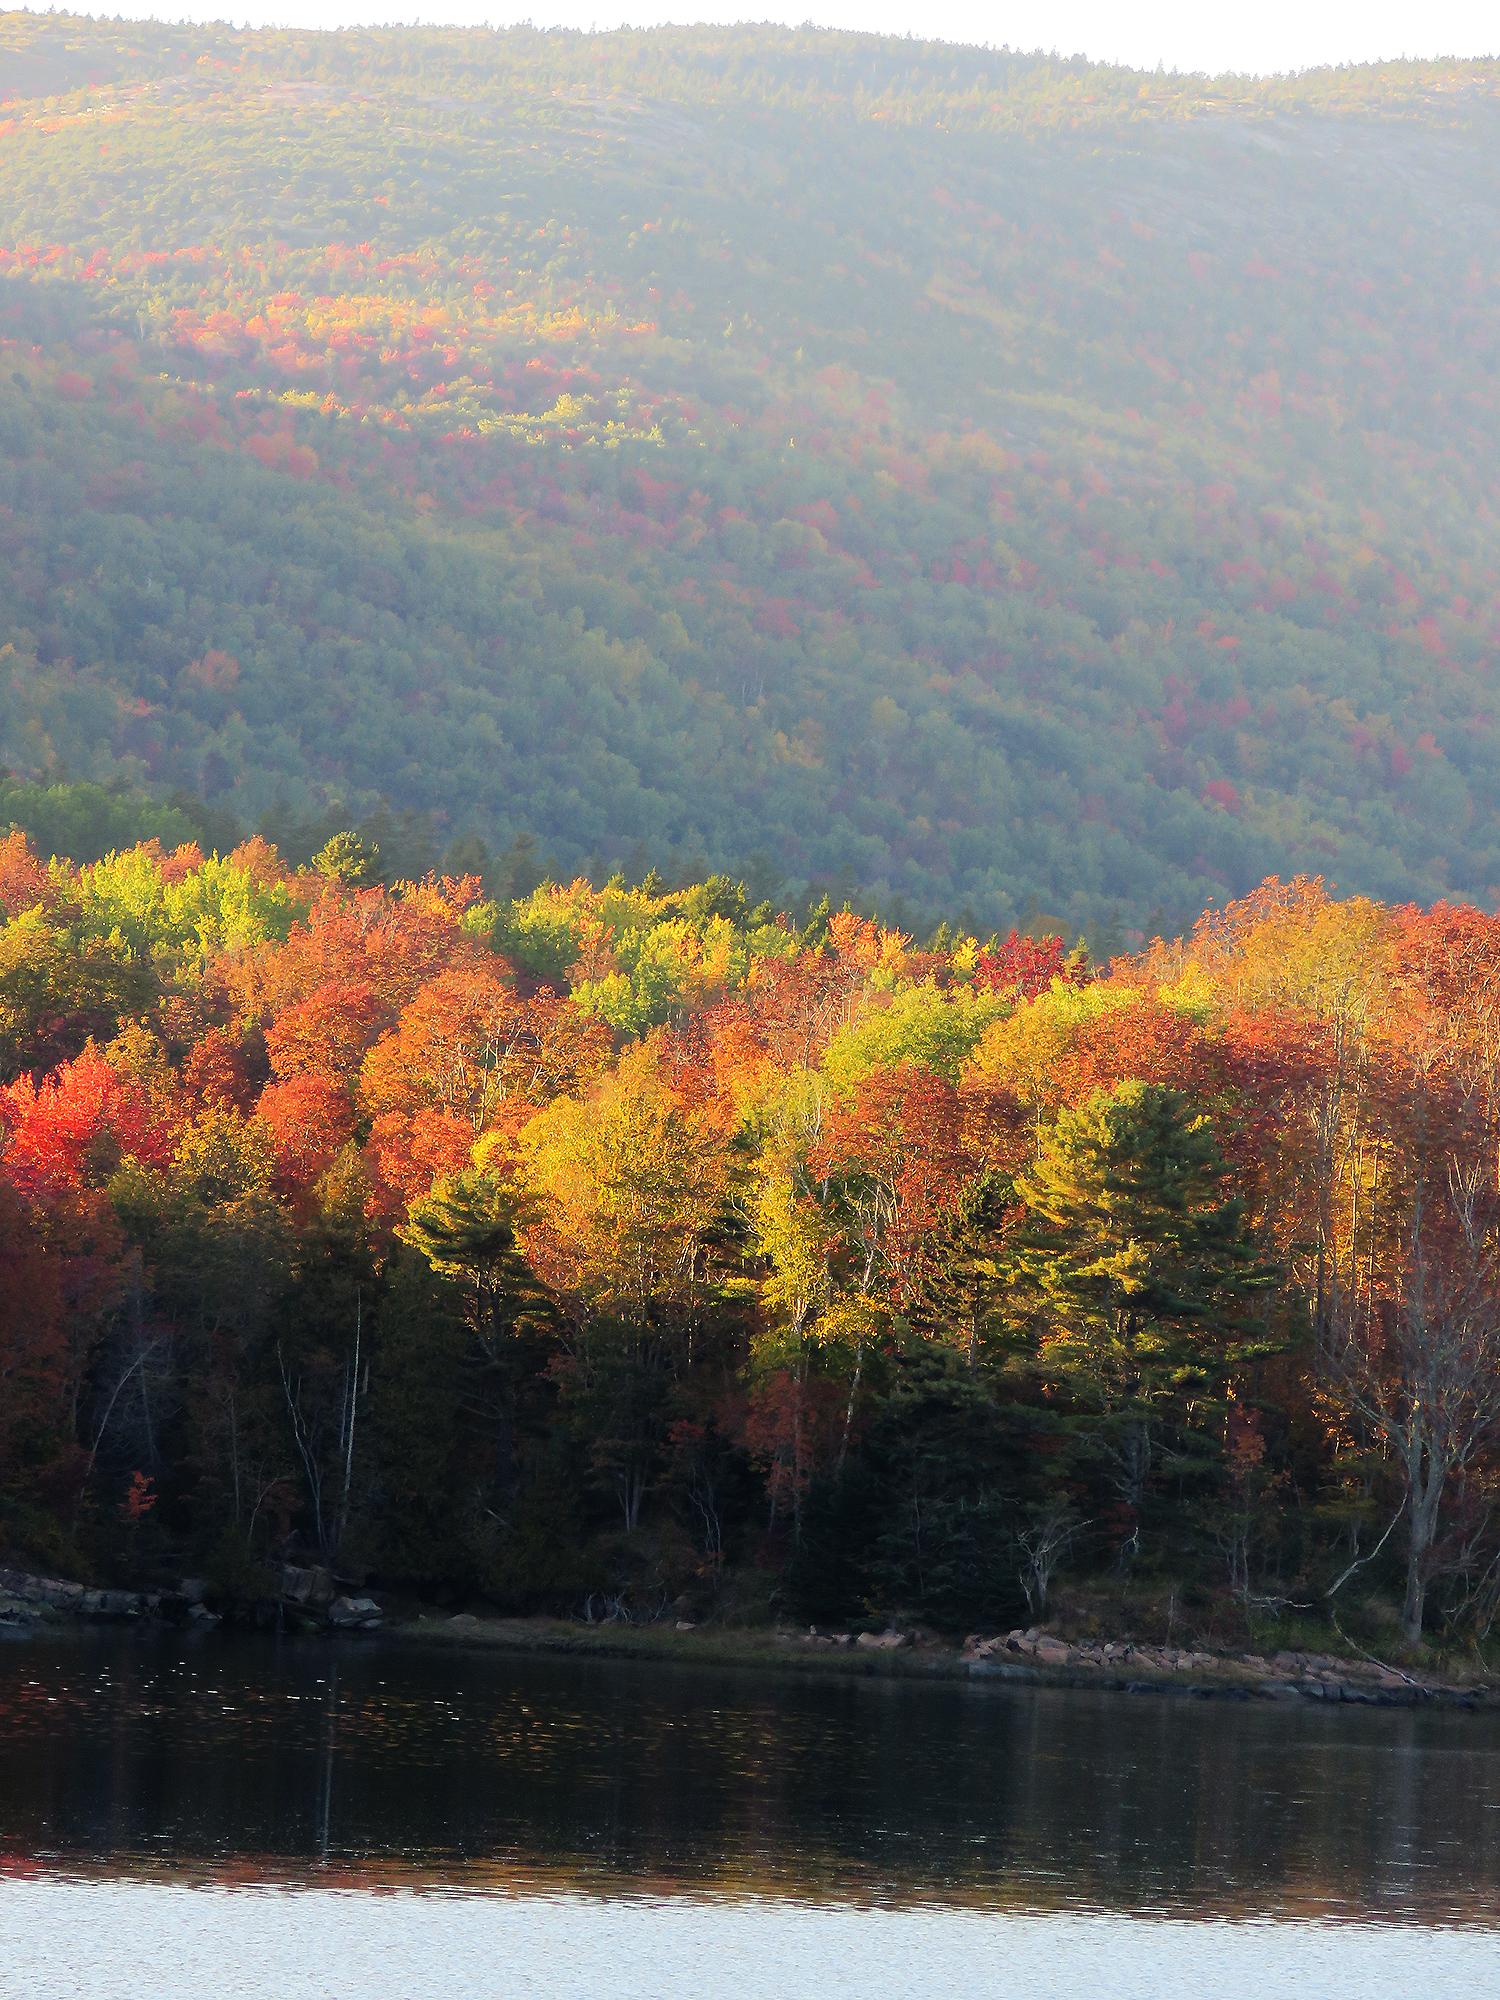 Lövskog i nationalparken Acadia, Maine. Foto: Erik Bergin